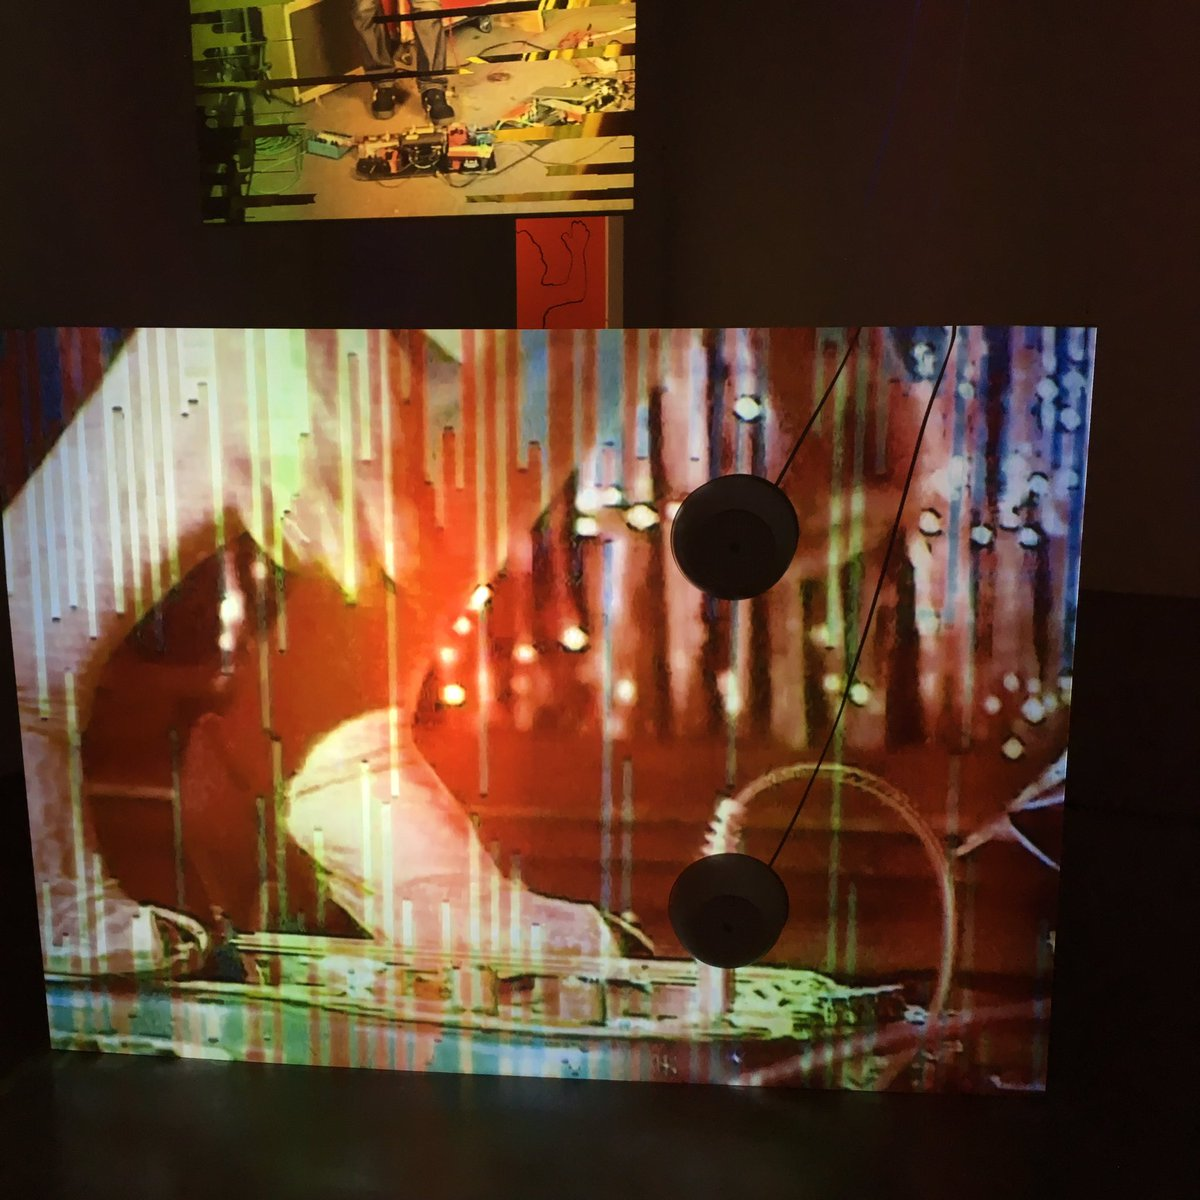 Les jambes de Kim Gordon par #tonyoursler Sound disgressions full Spectrum #galeriemitterrand<br>http://pic.twitter.com/wSR7euQxTM